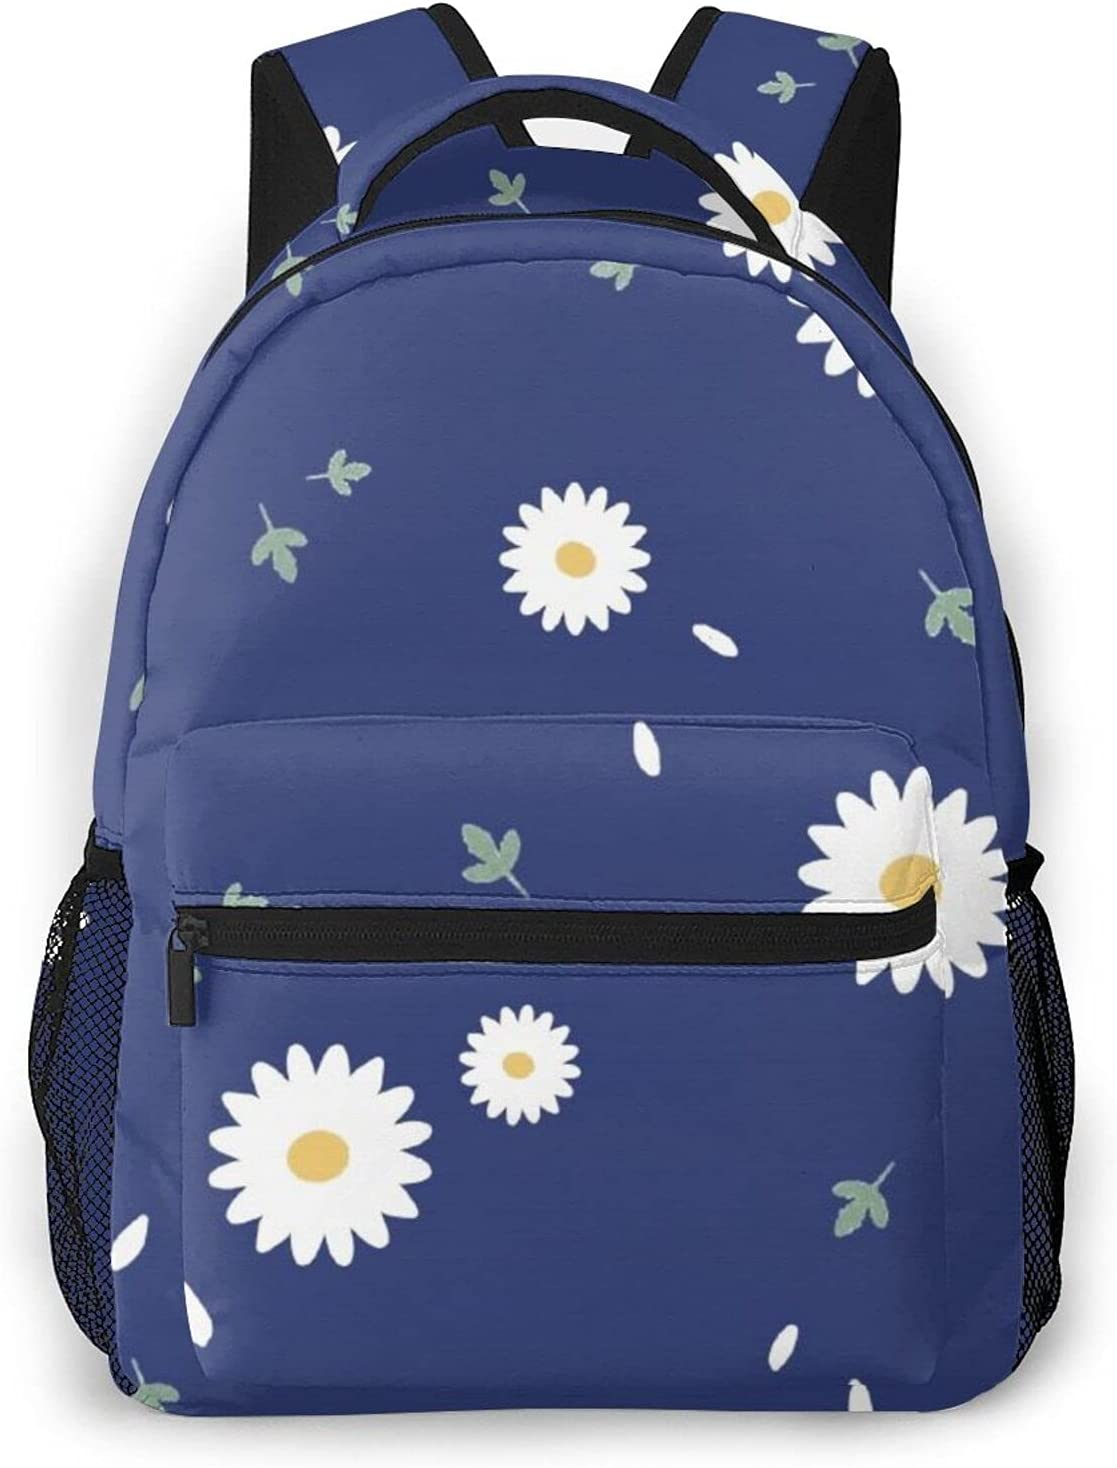 NINAINAI Fashion Blue store White Backpack Male Daisy Eco-Friendly Max 47% OFF